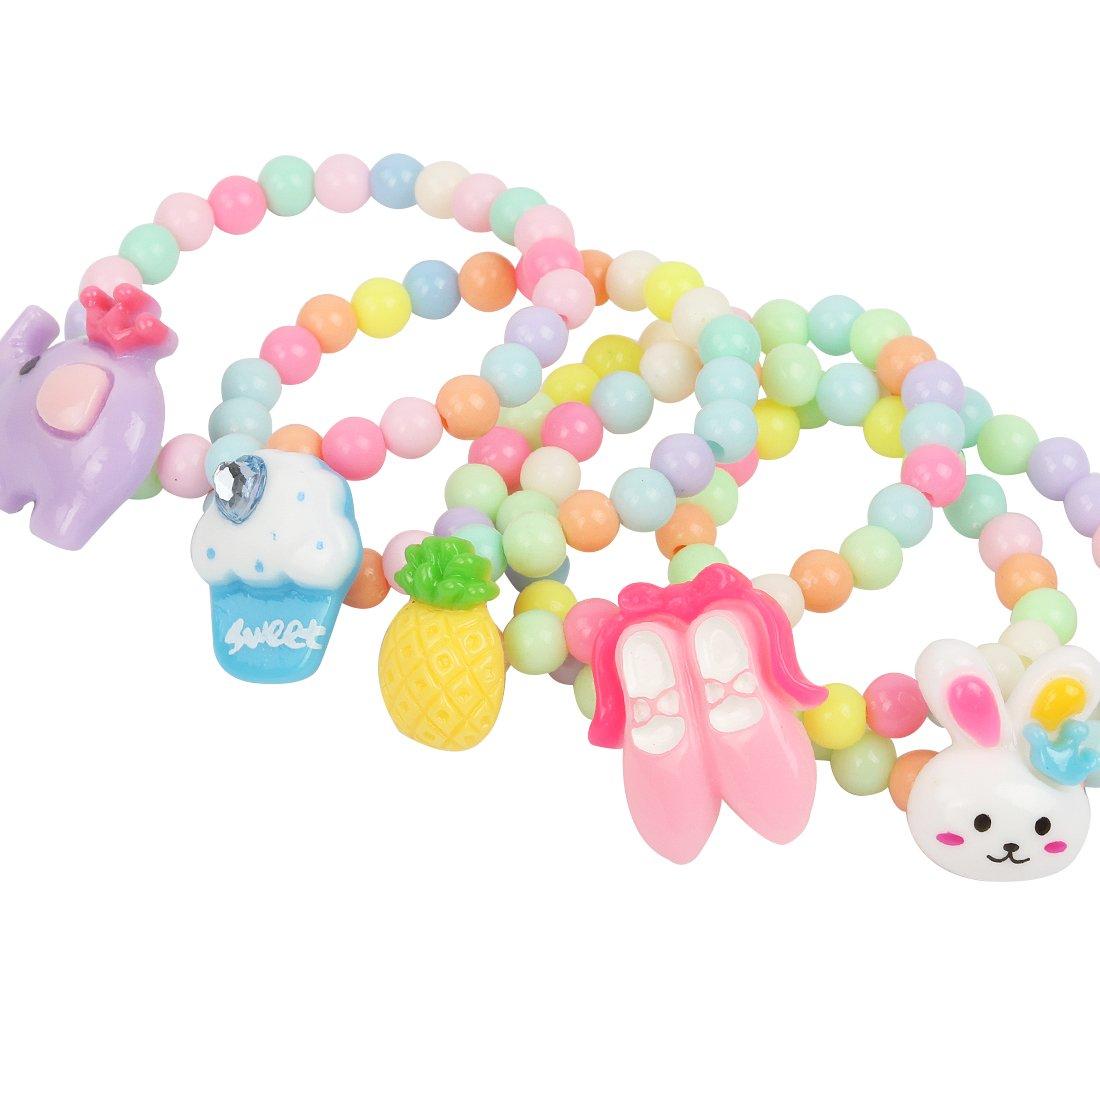 kilofly 6 Sets Princess Party Favors Girls Jewelry Rings Elastic Bracelets Pack by kilofly (Image #4)